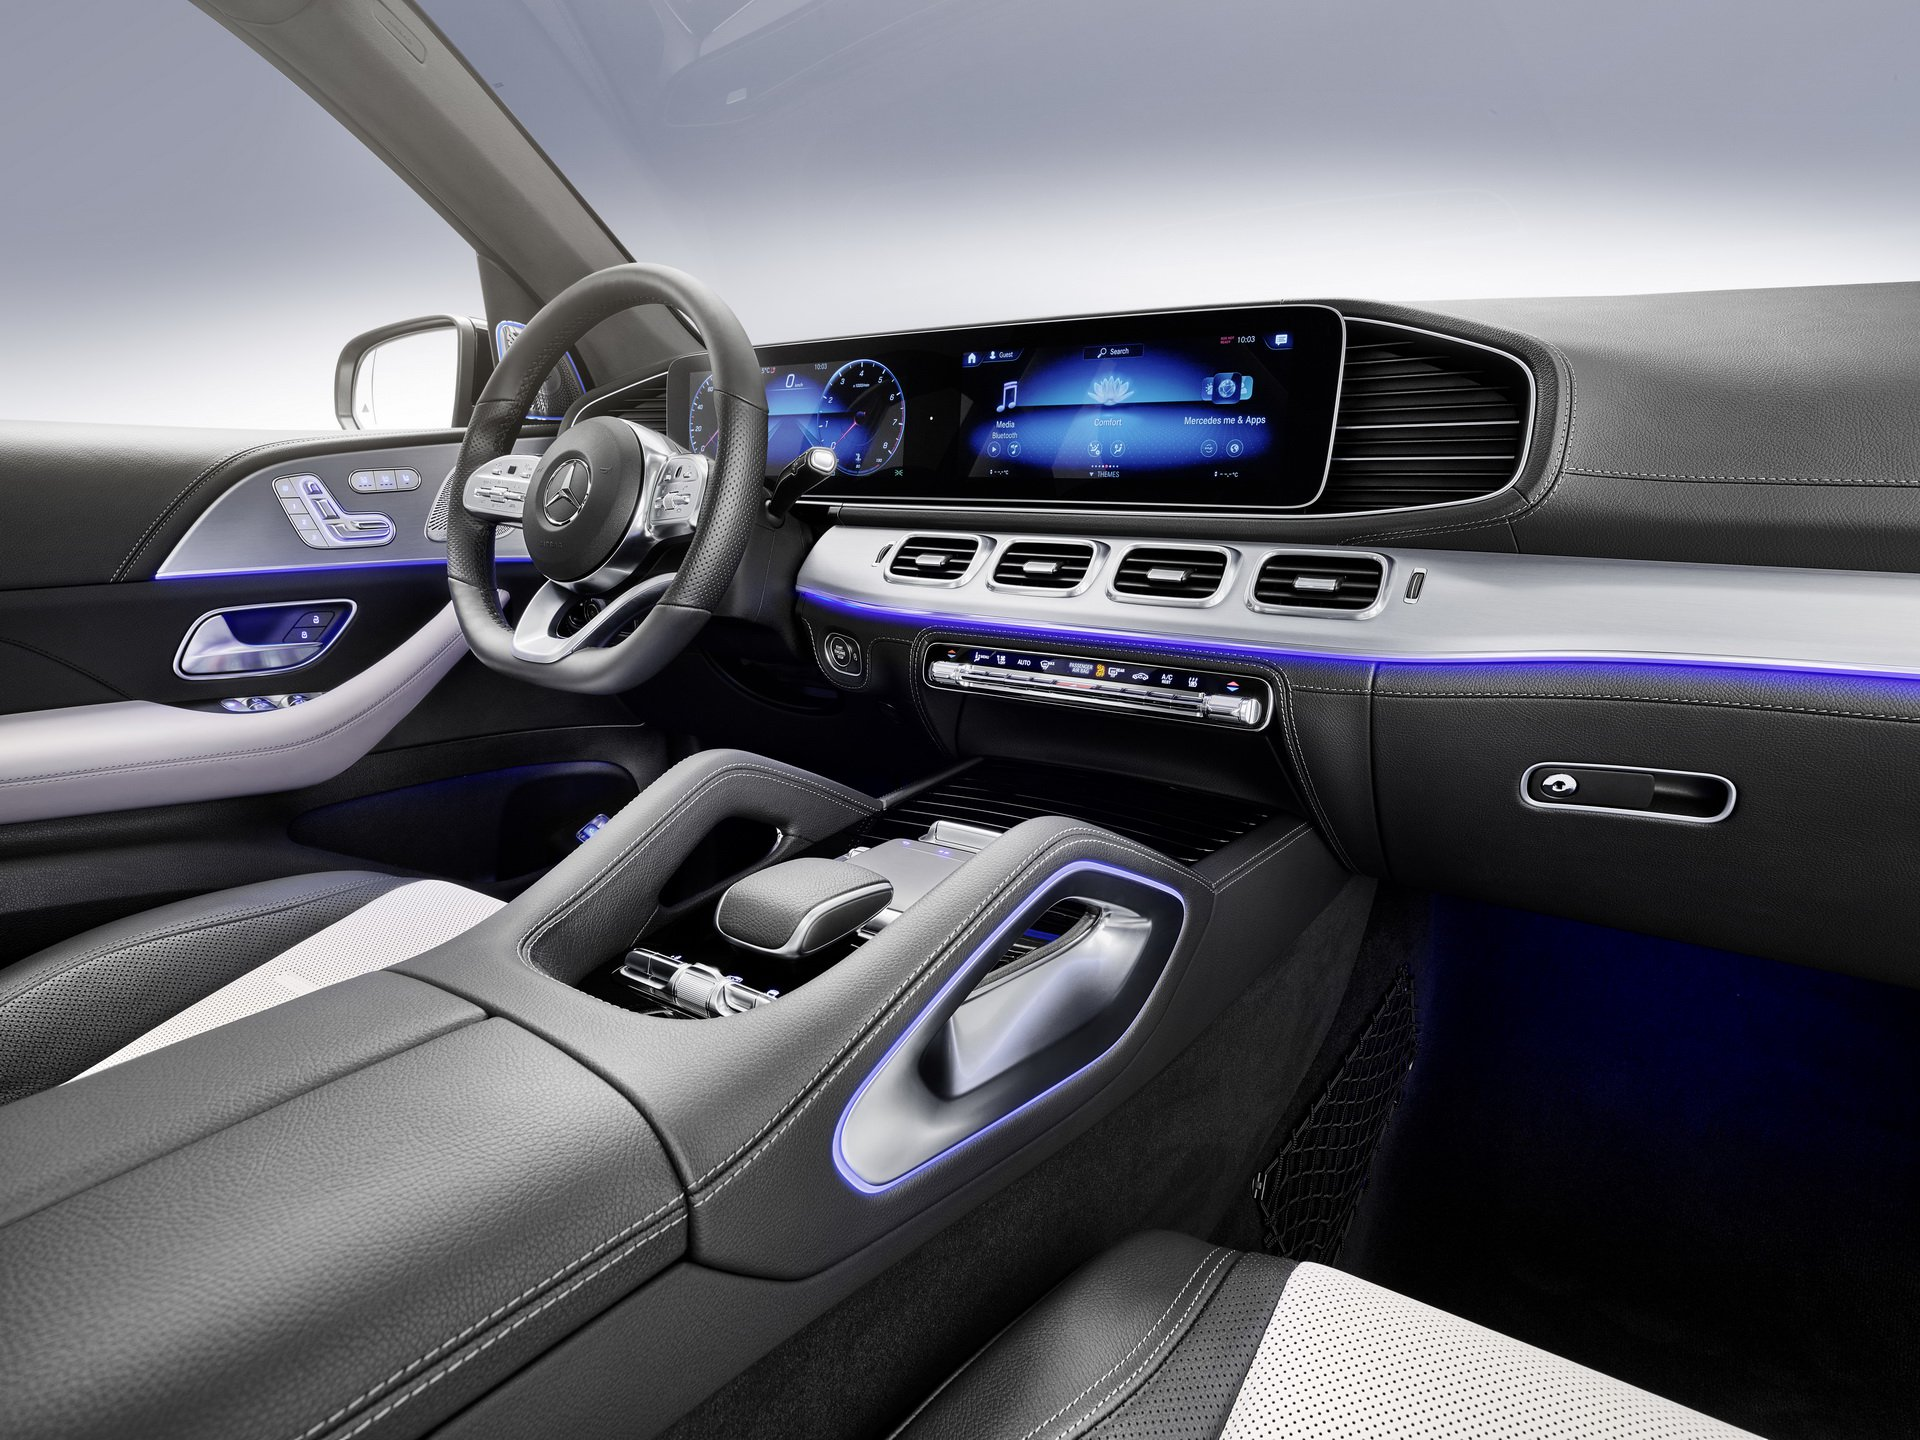 2020 Mercedes-Benz GLE 580 4Matic Joins U.S. Lineup - autoevolution